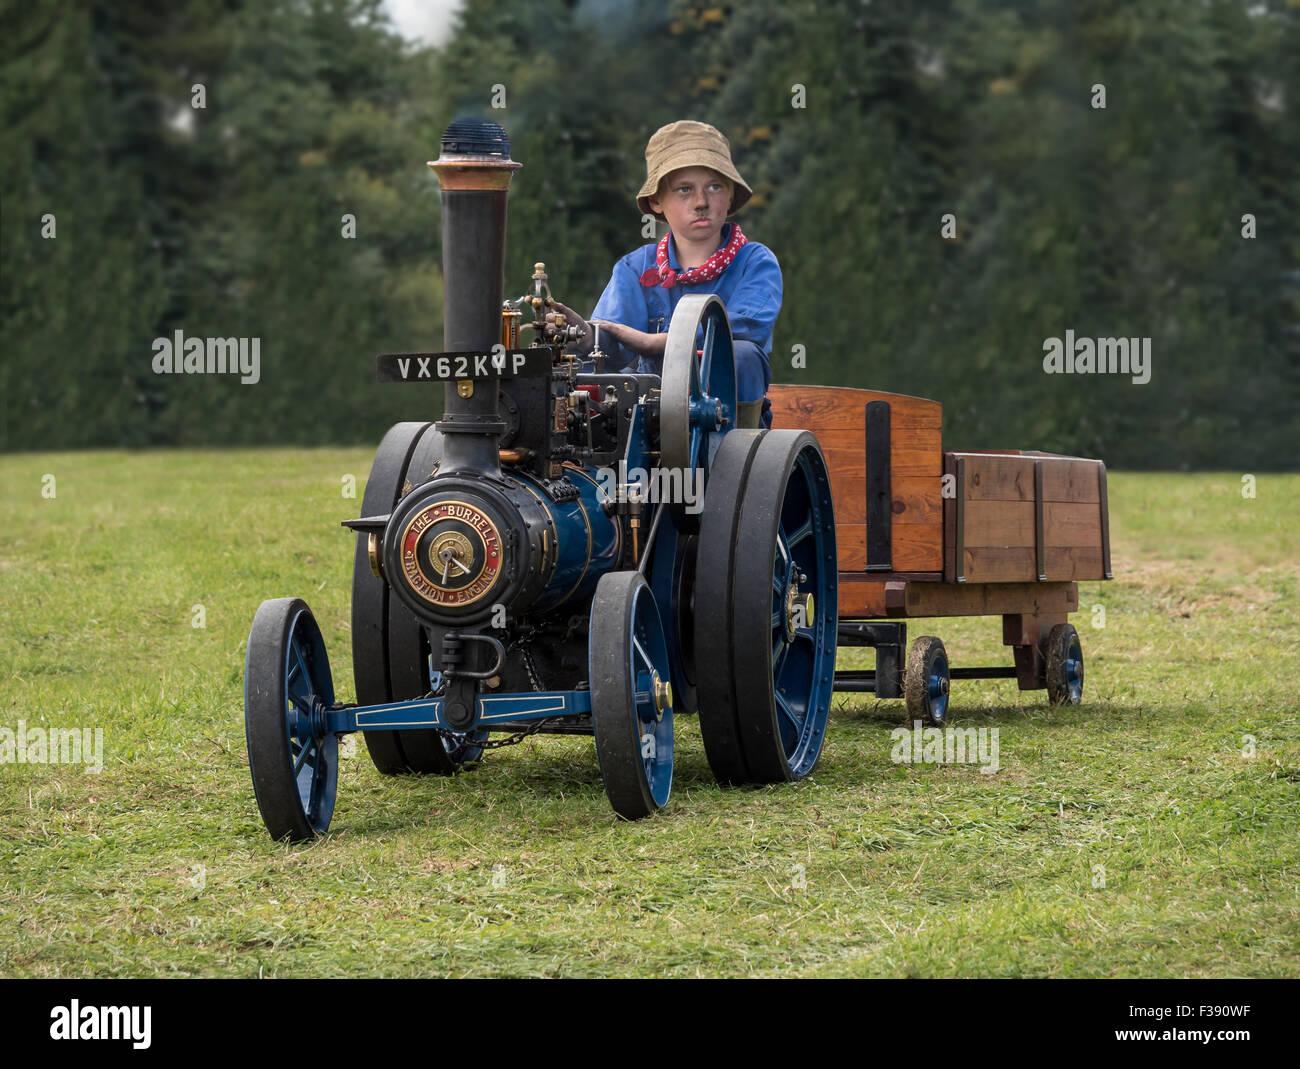 Model Vintage Steam Traction Locomotive - Stock Image